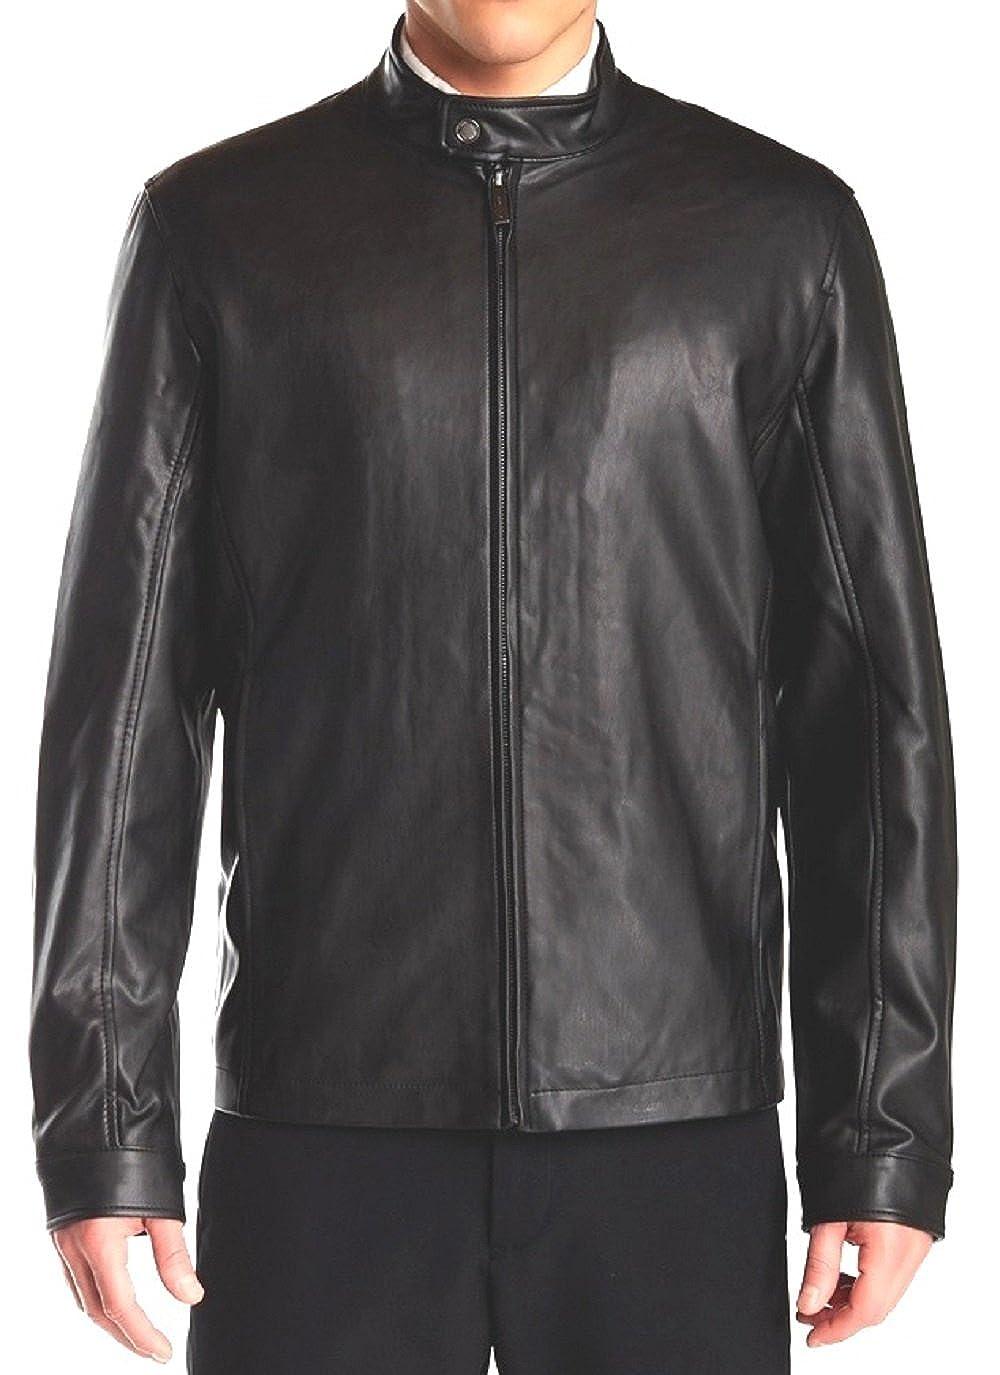 c4afc44ab Perris Ellis Men's Faux Leather Bomber Jacket (Black, Large) at ...